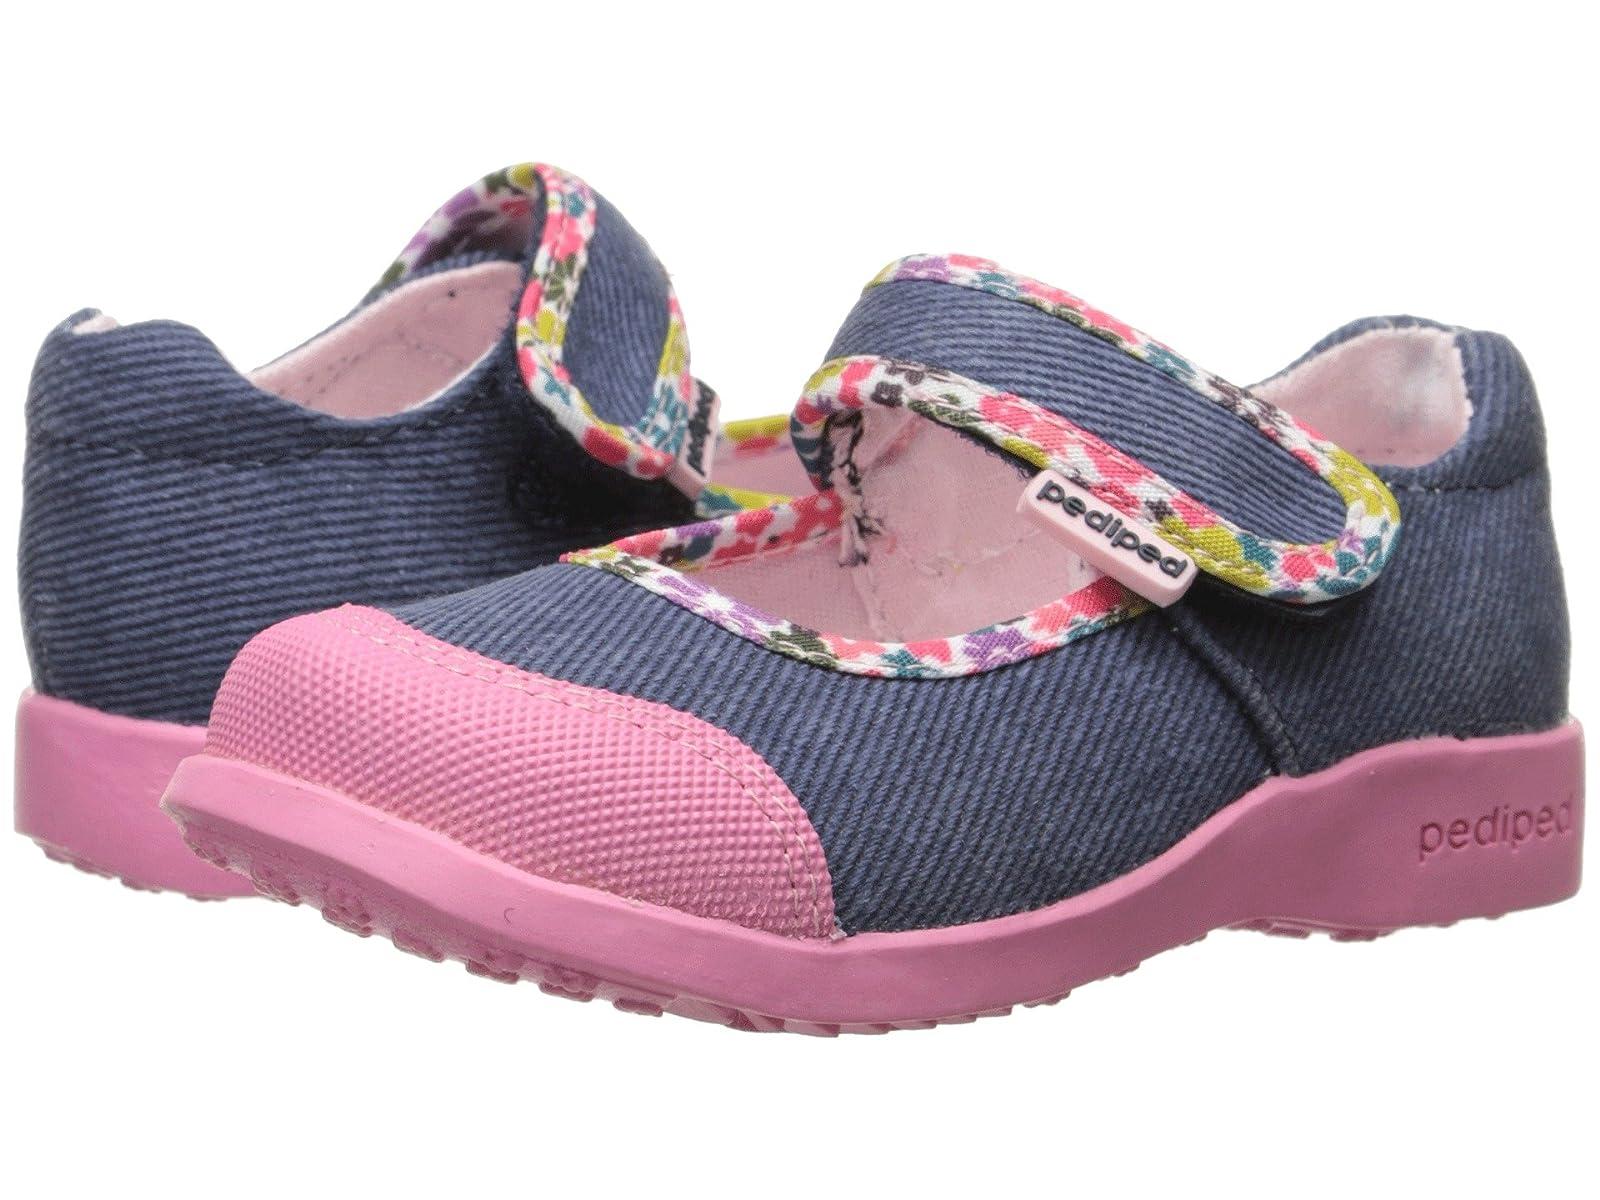 pediped Bree Flex (Toddler/Little Kid)Atmospheric grades have affordable shoes